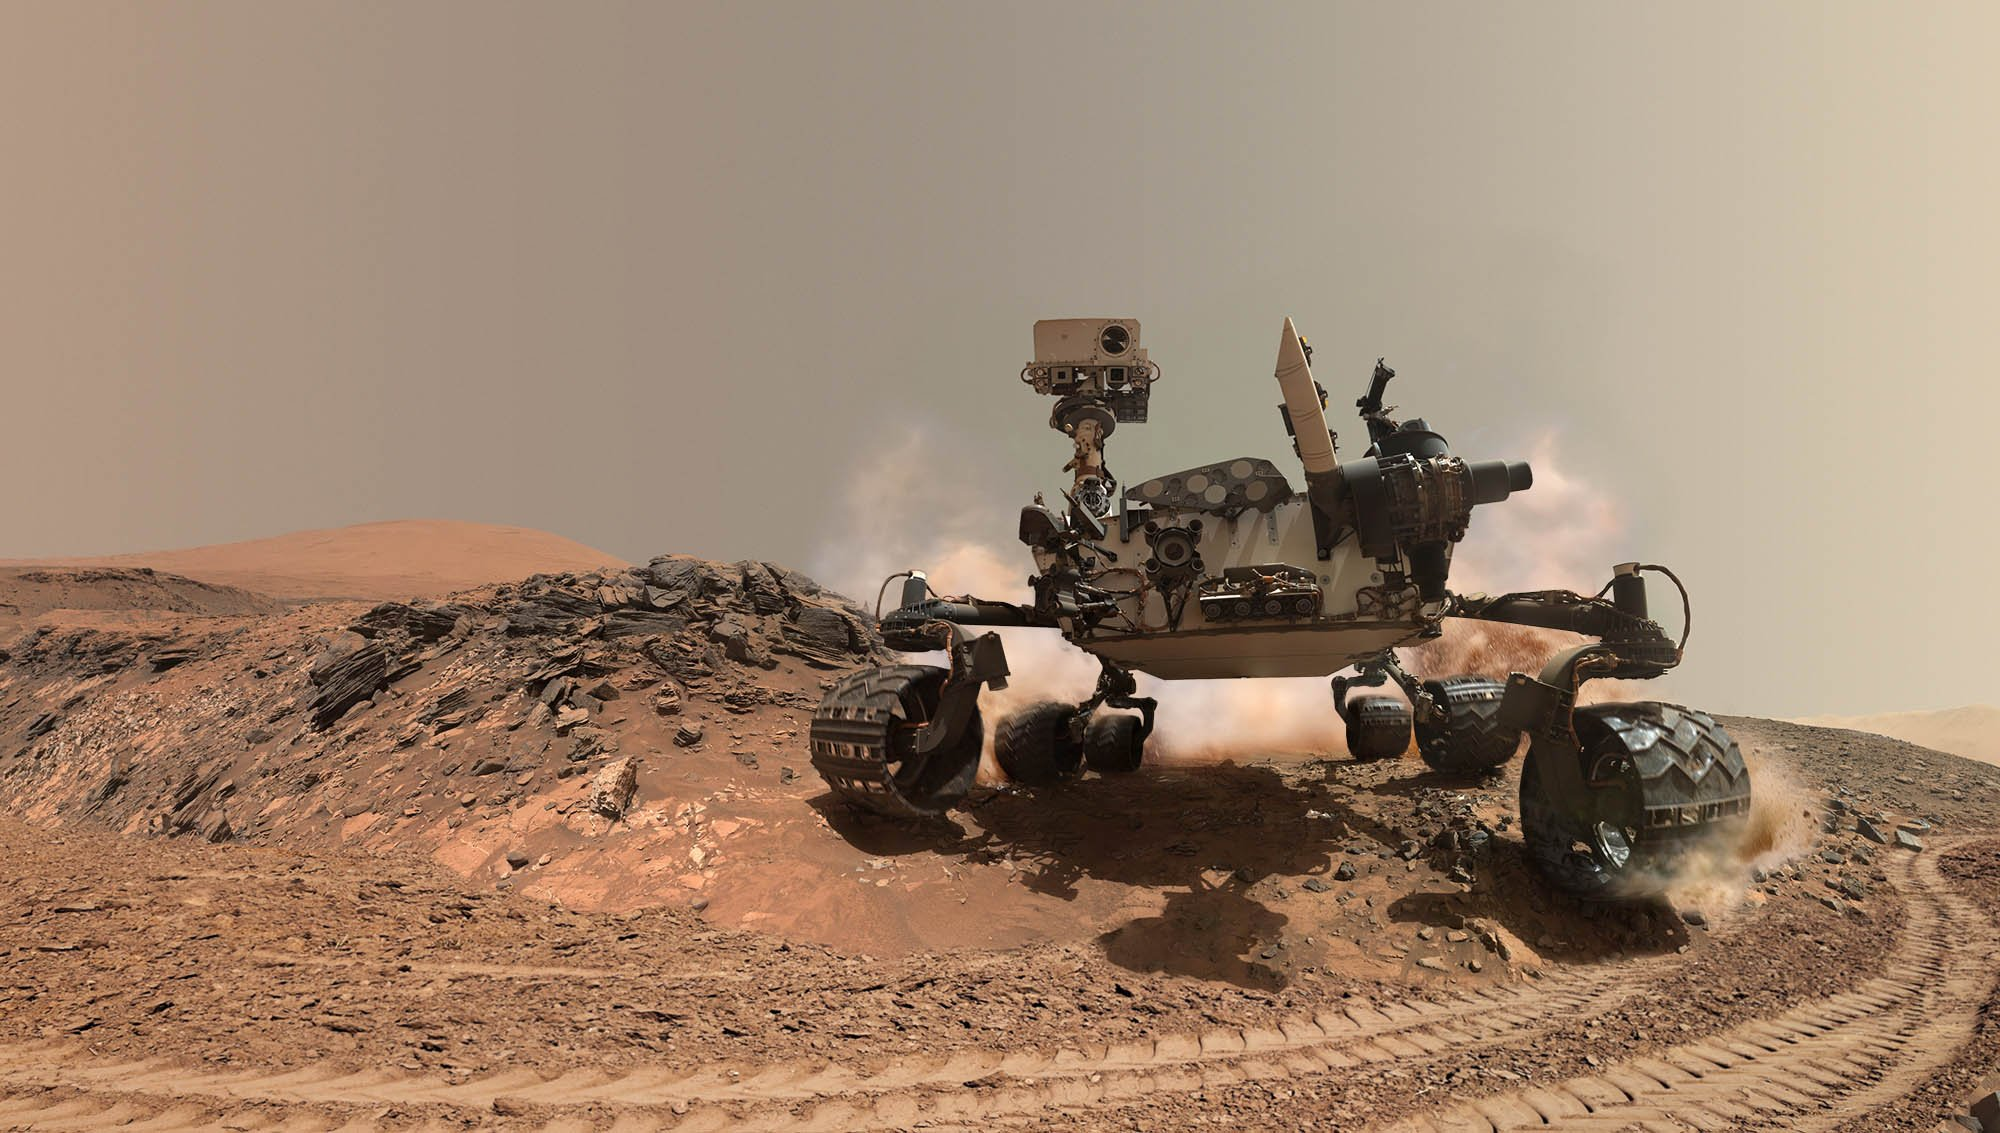 curiosity rover wiki - HD2000×1133